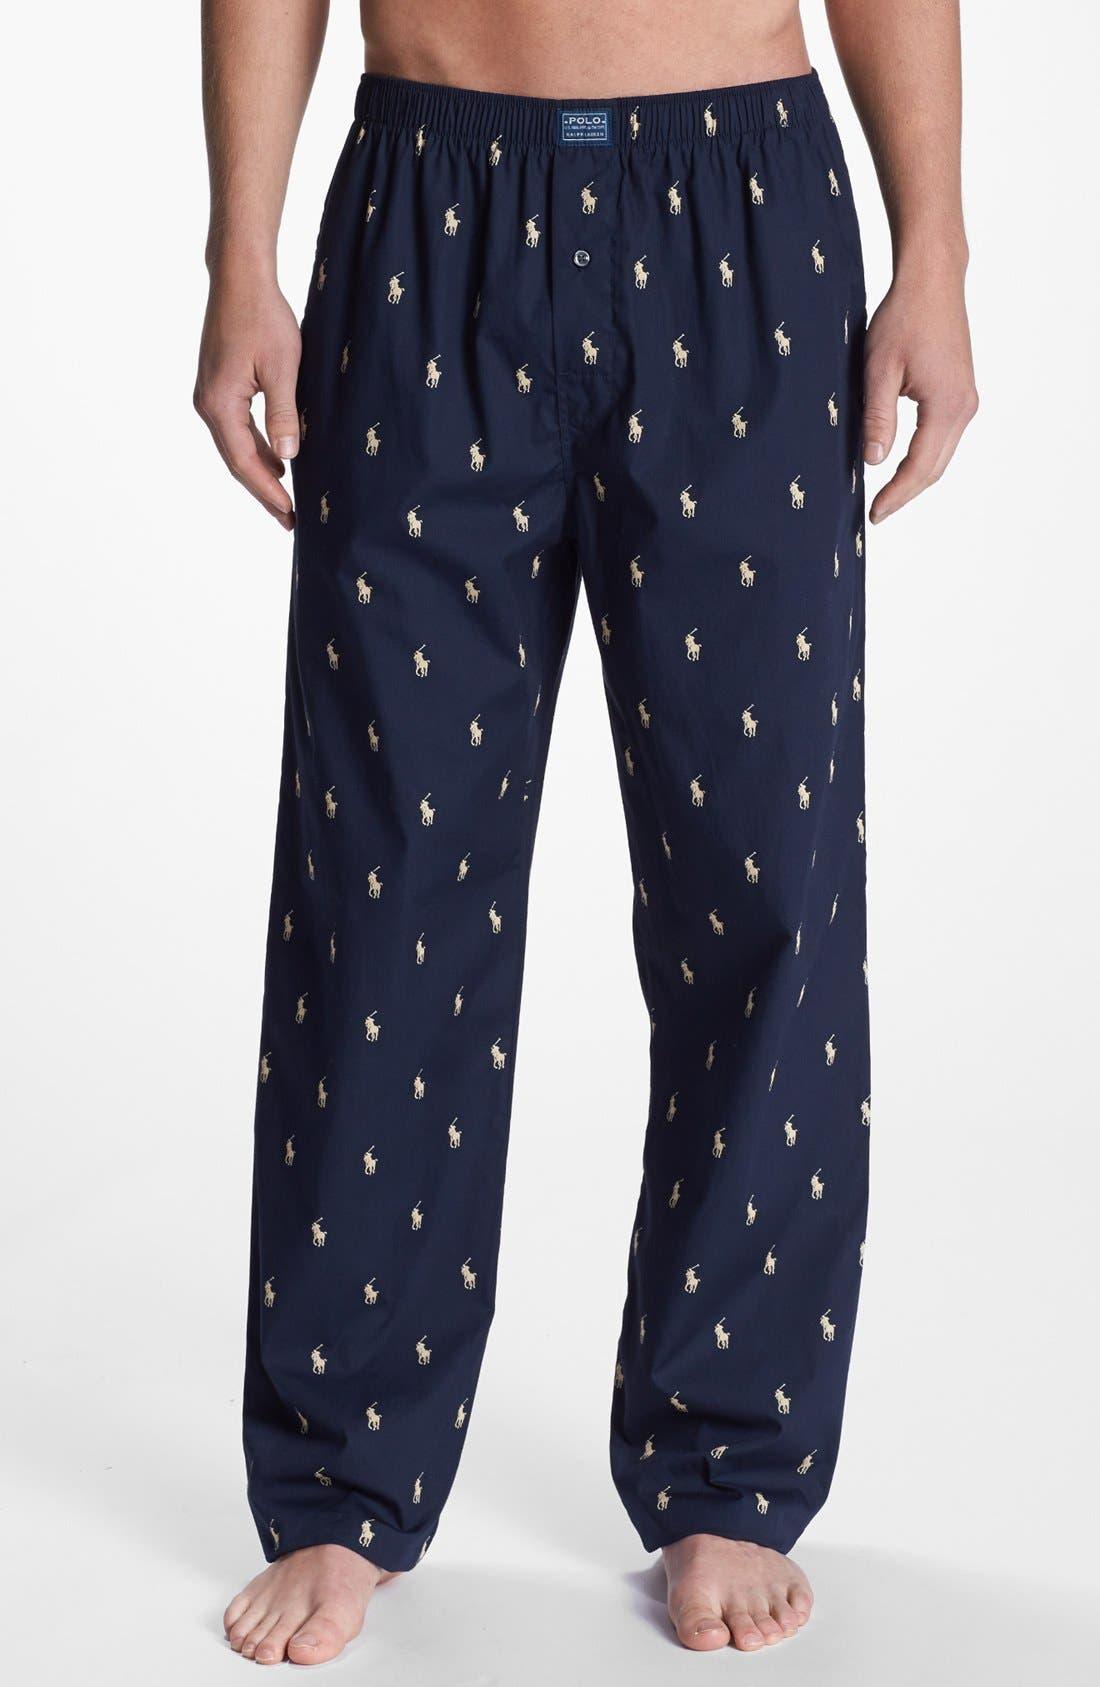 Cotton Lounge Pants,                         Main,                         color, Navy/ White